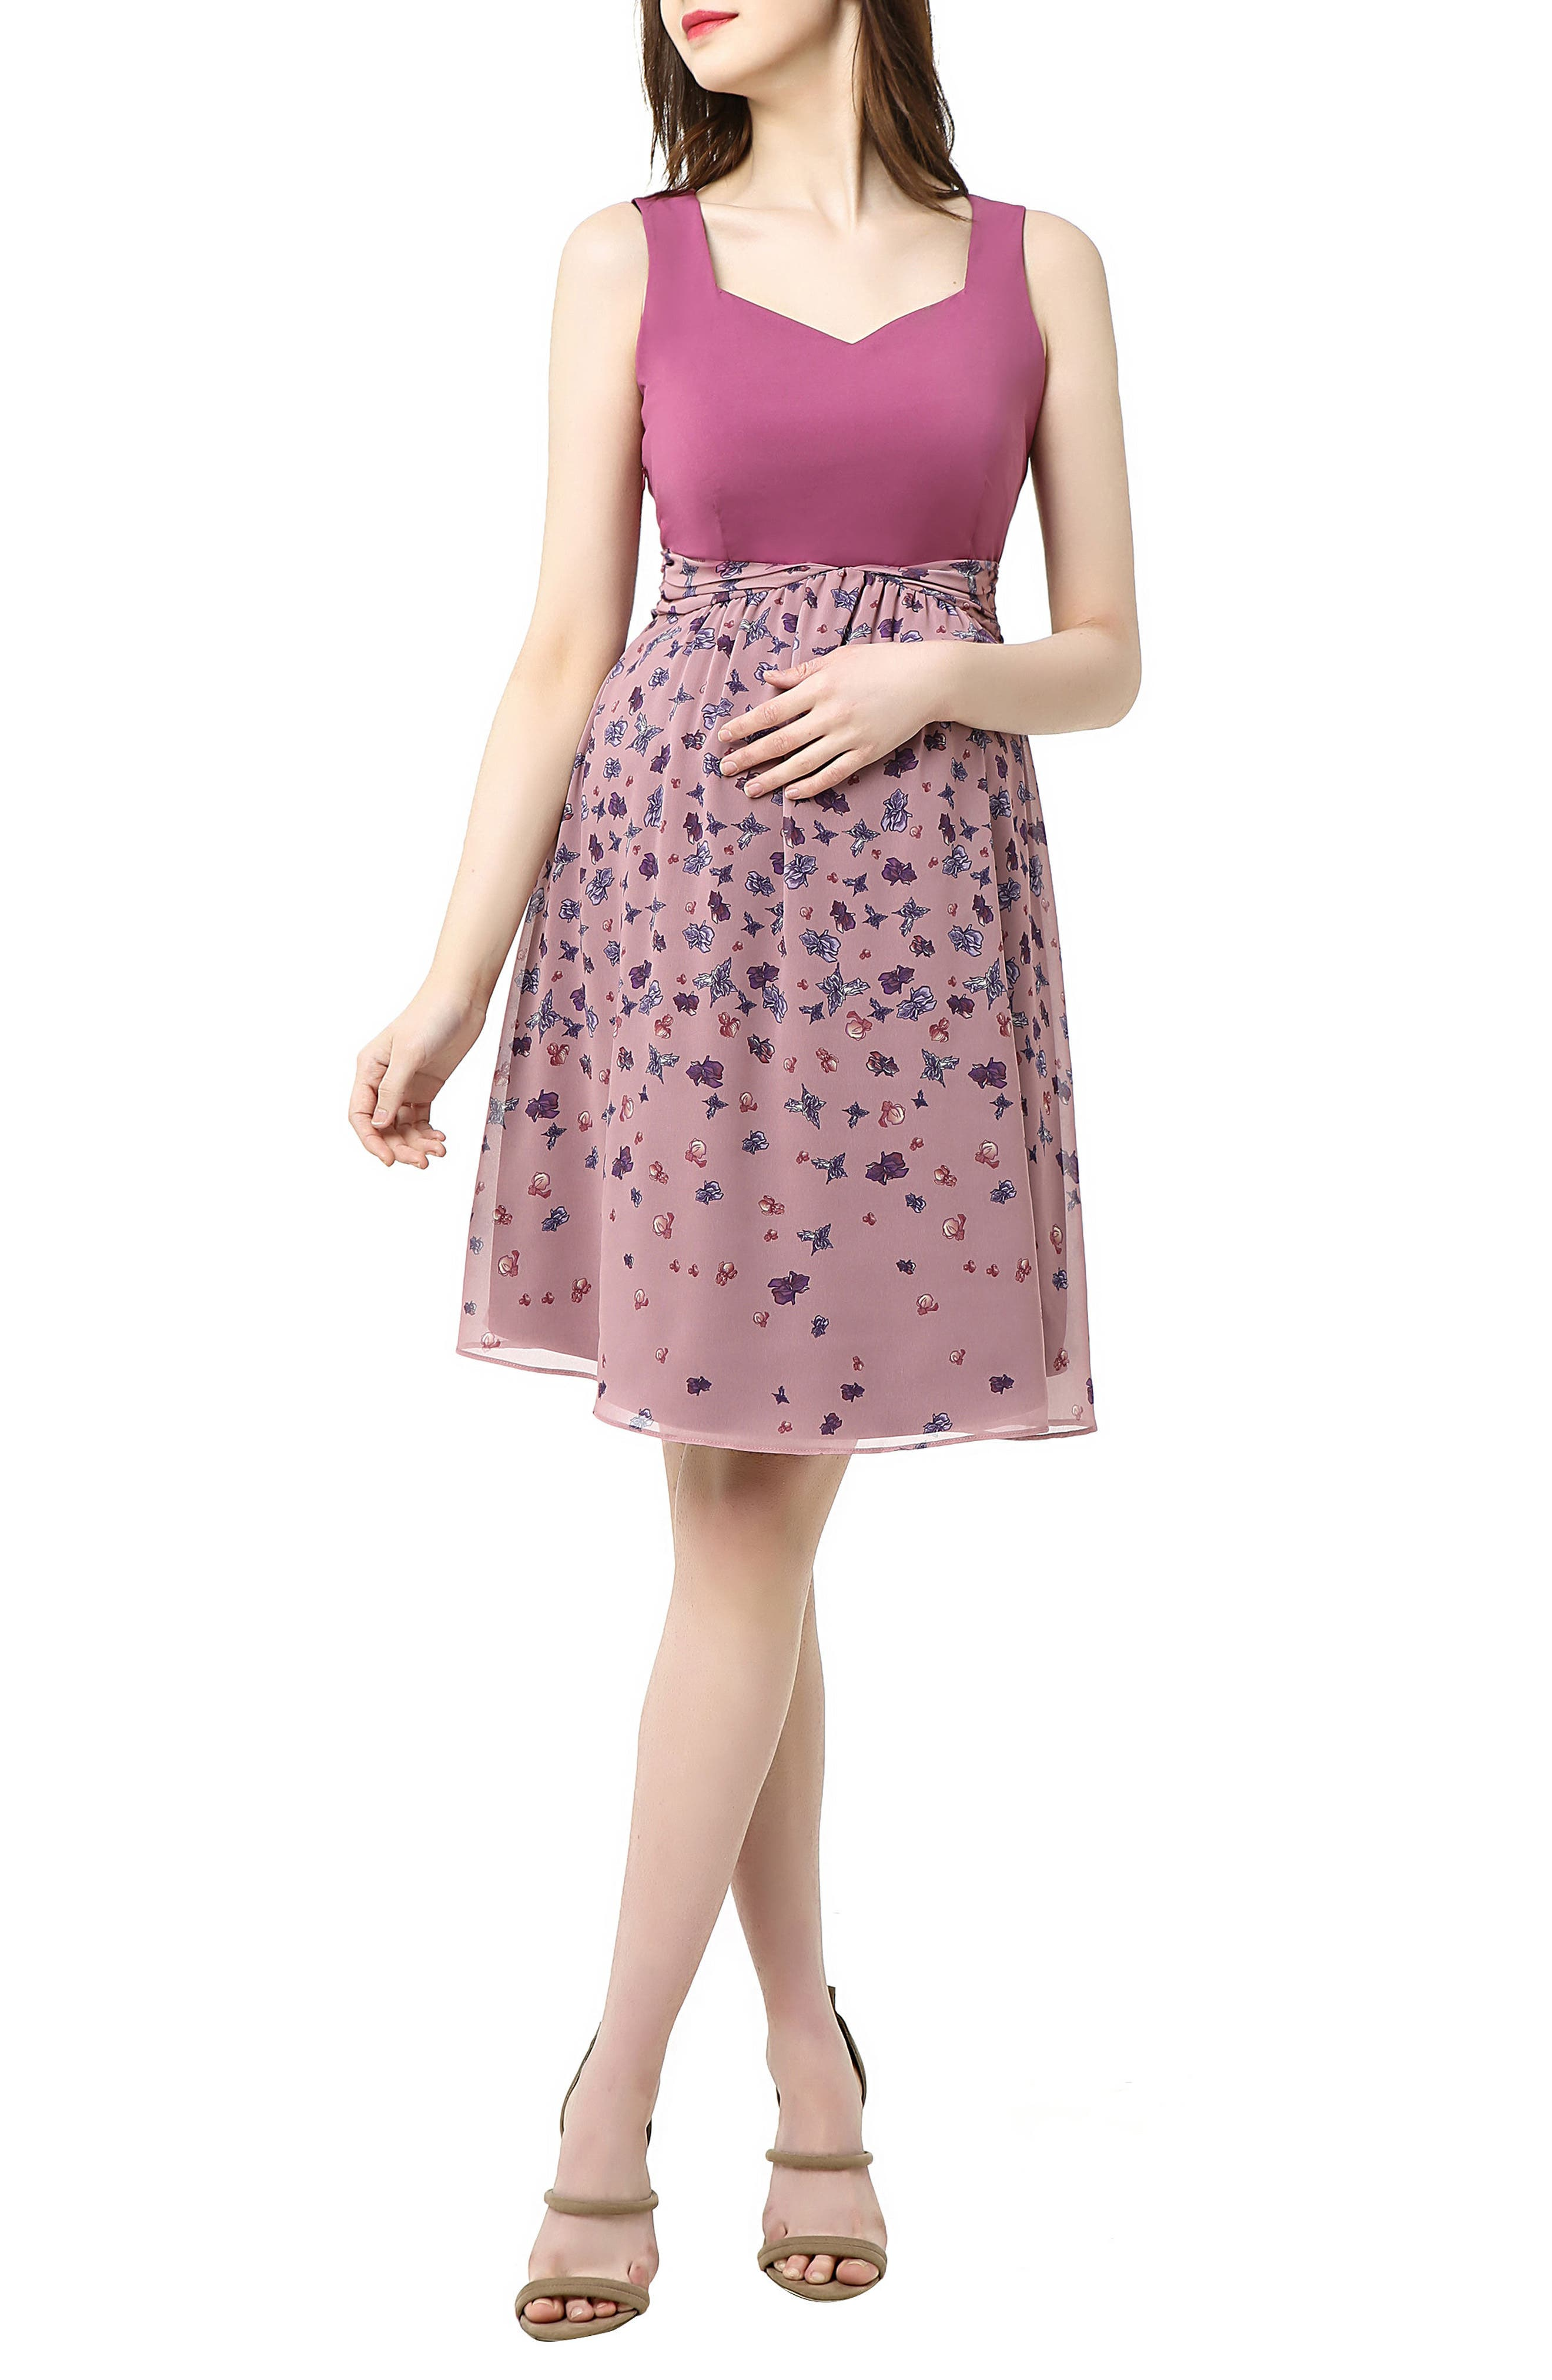 Libby Print Skirt Maternity Dress,                         Main,                         color, Rose Pink